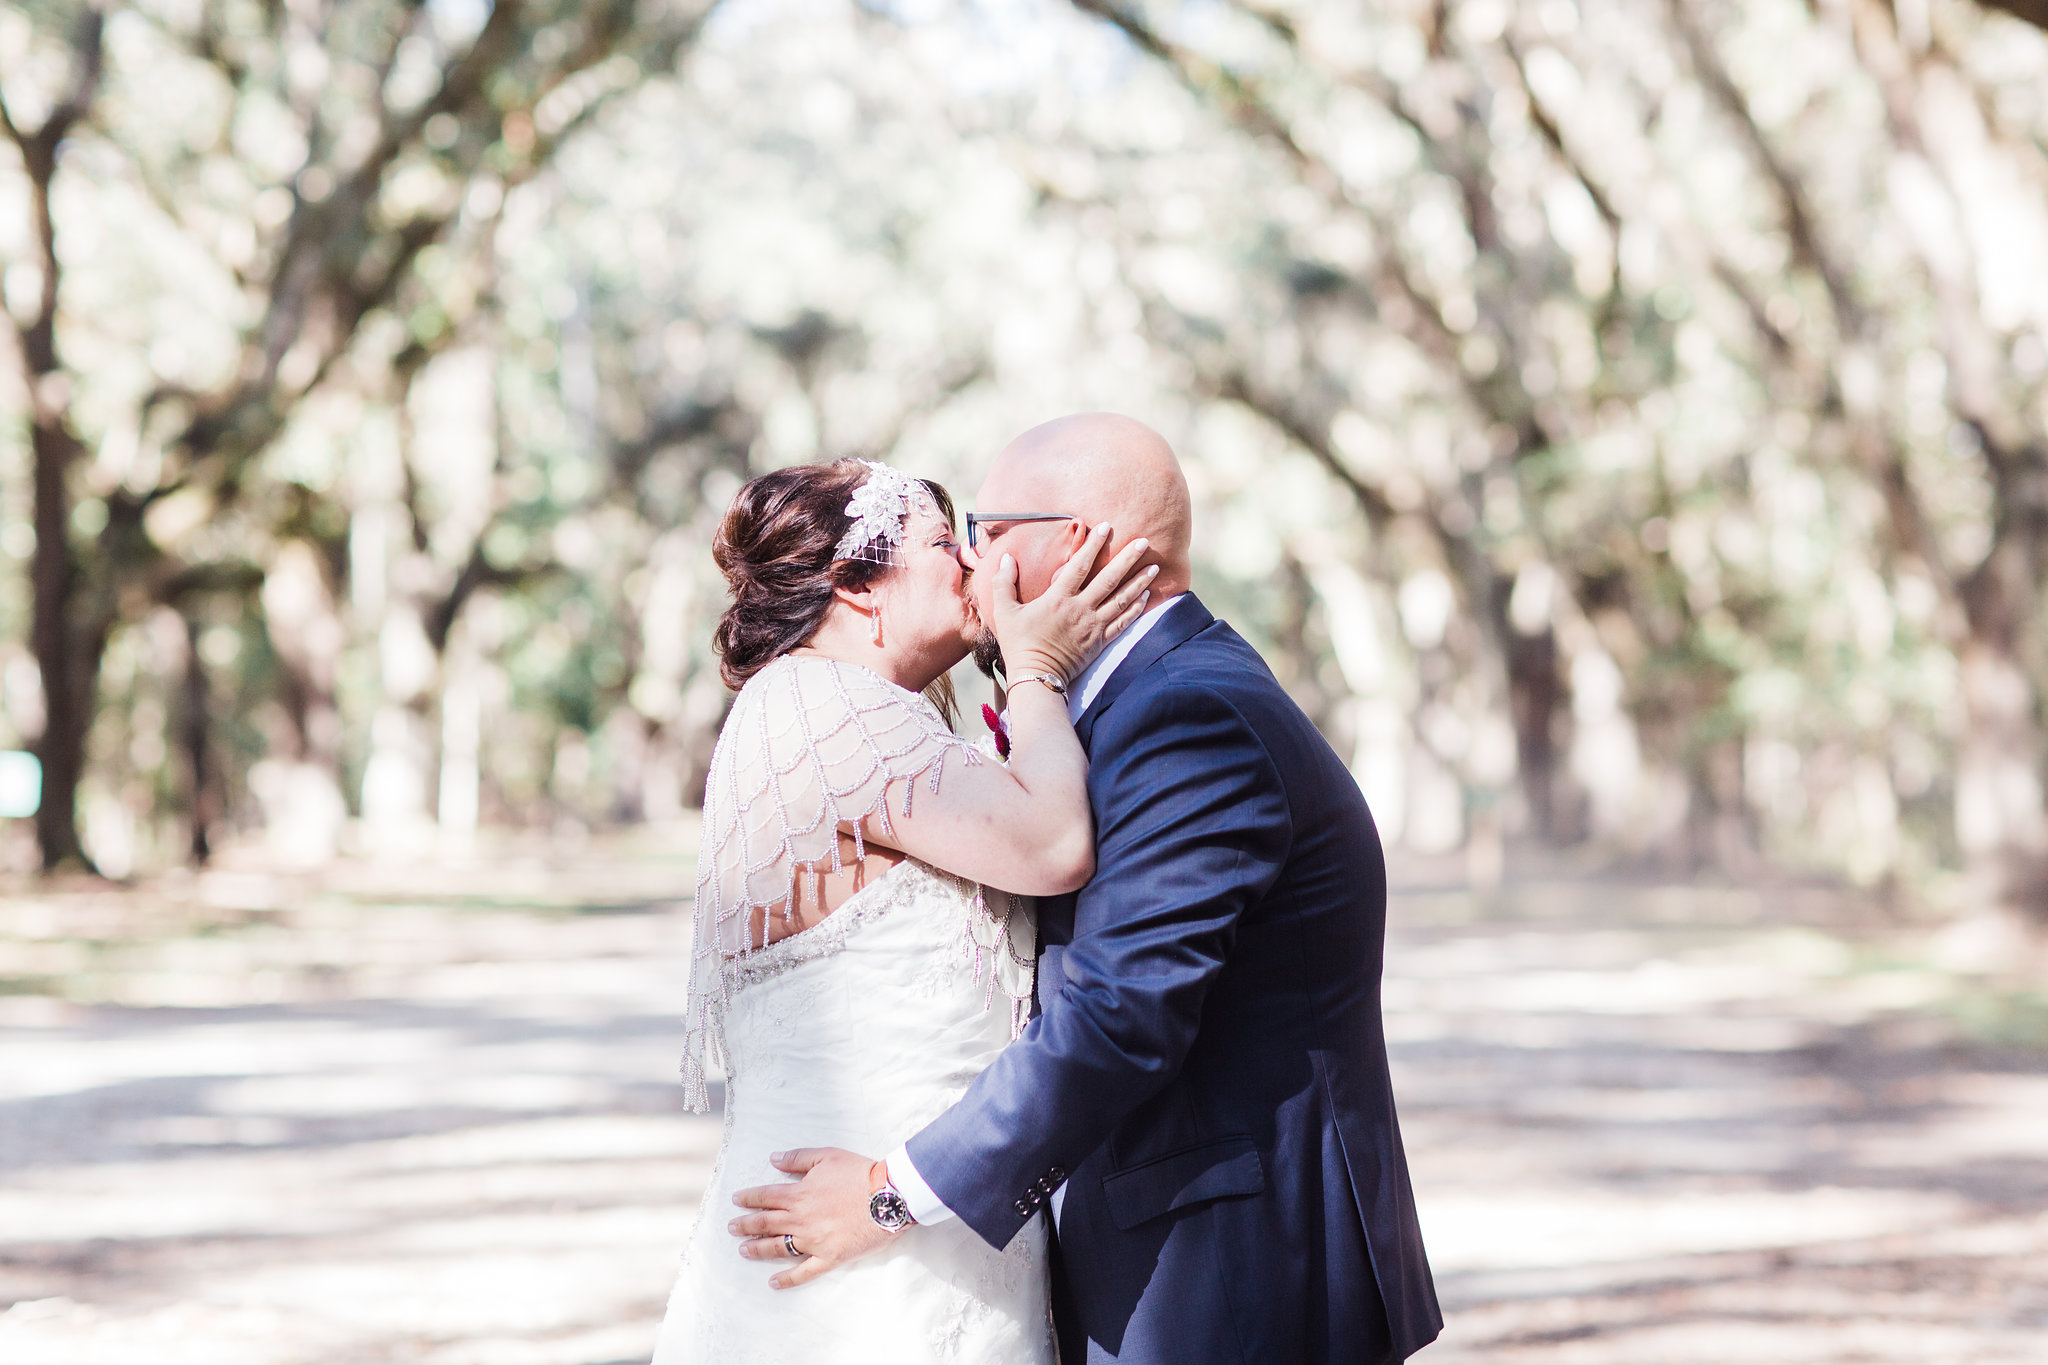 apt-b-photography-kristy-rob-wormsloe-elopment-savannah-wedding-photographer-savannah-elopement-wormsloe-wedding-historic-savannah-elopement-photographer-20.jpg